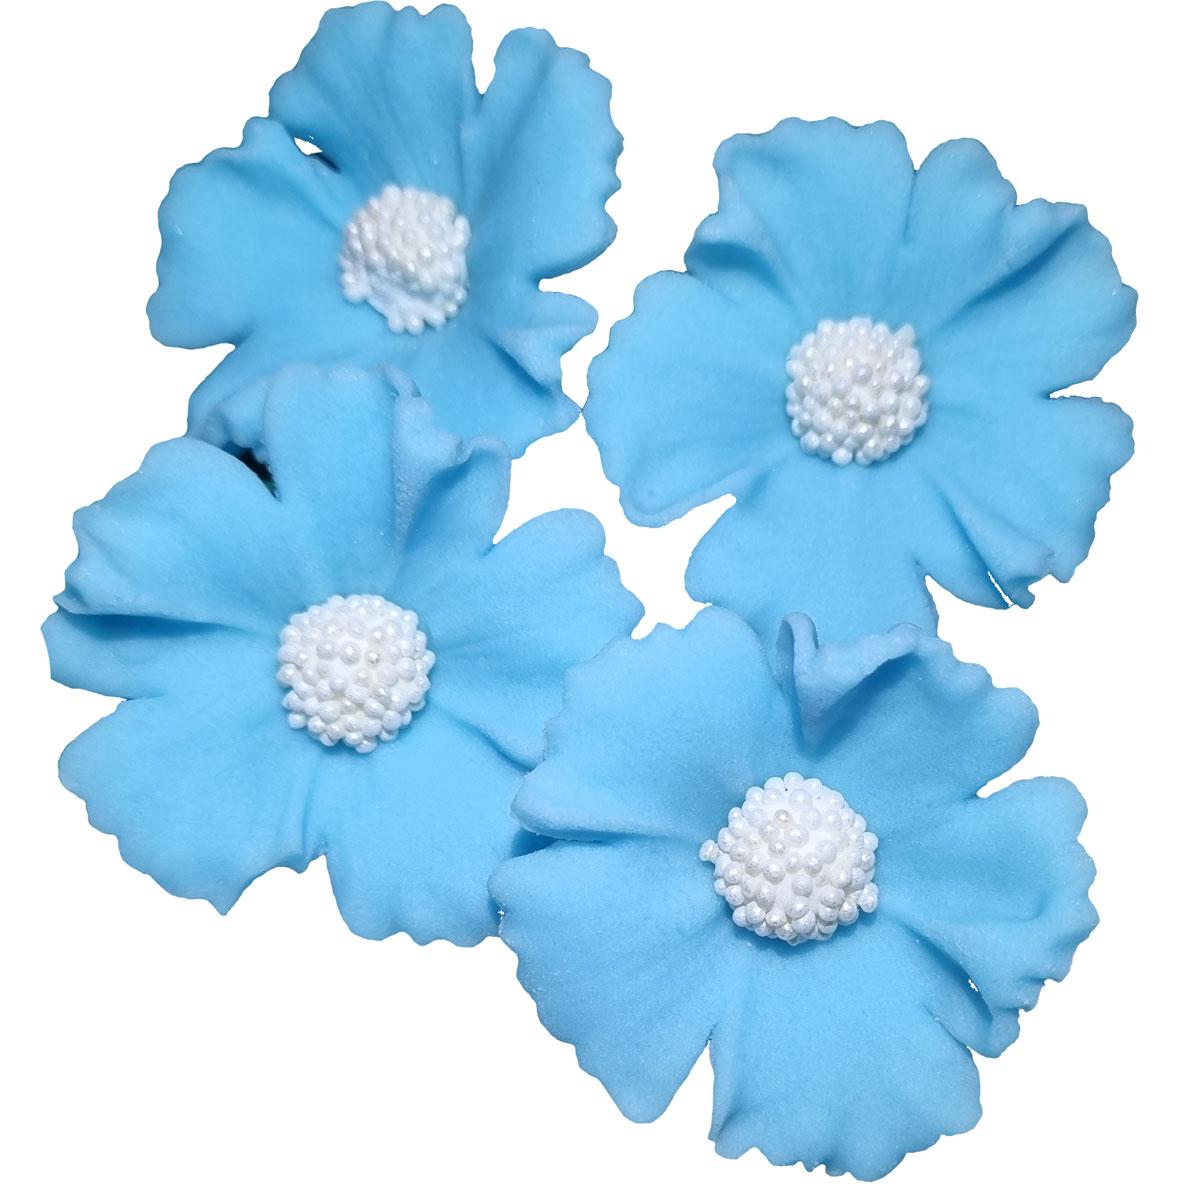 Zuckerblumen Kornblume 4 Stück - Babyblau